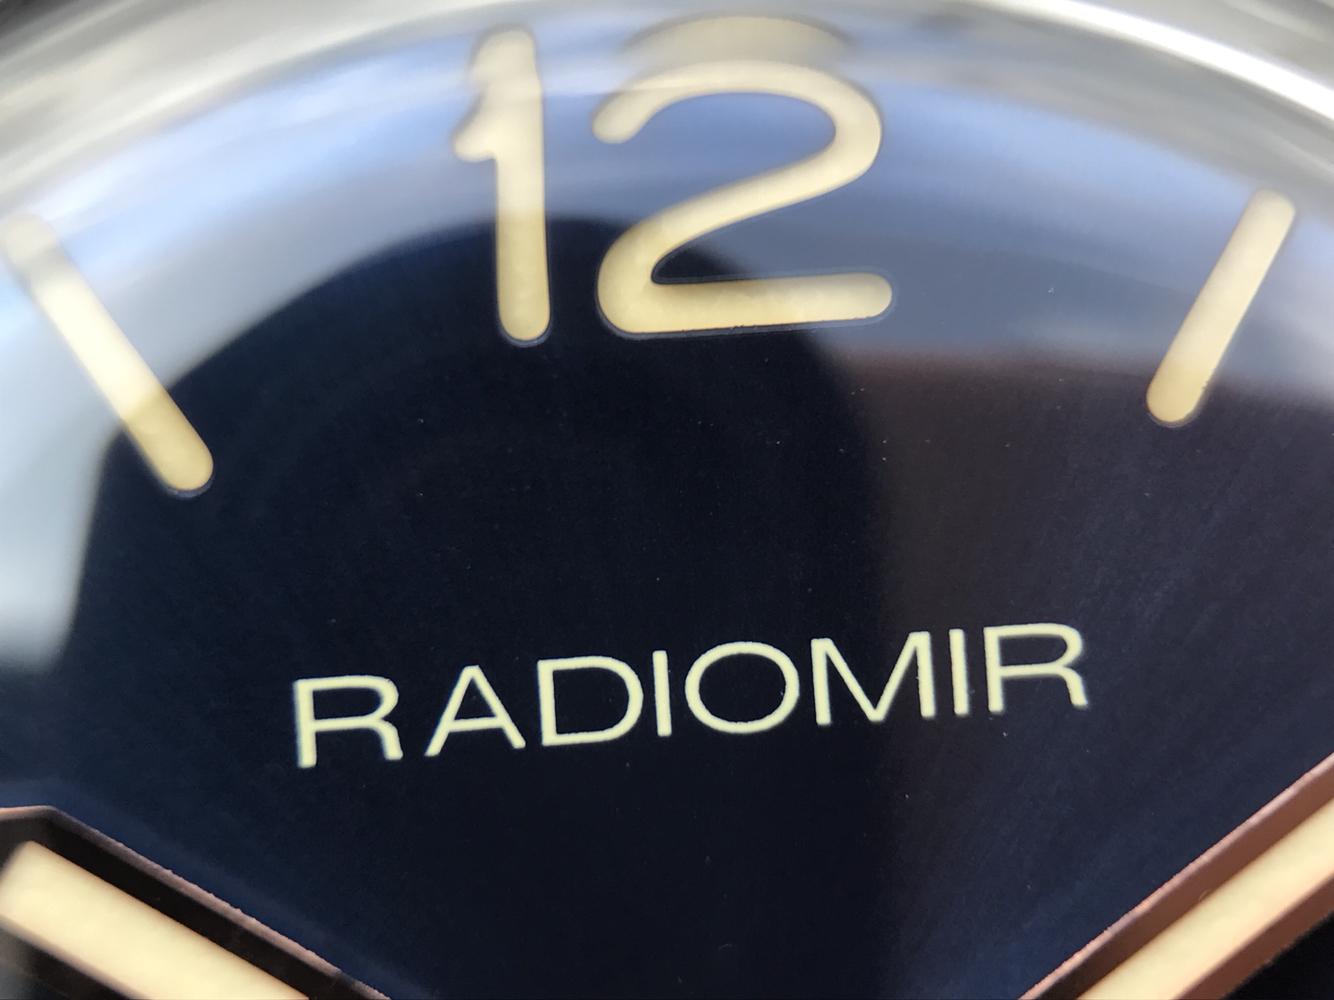 RADIOMIR Printing